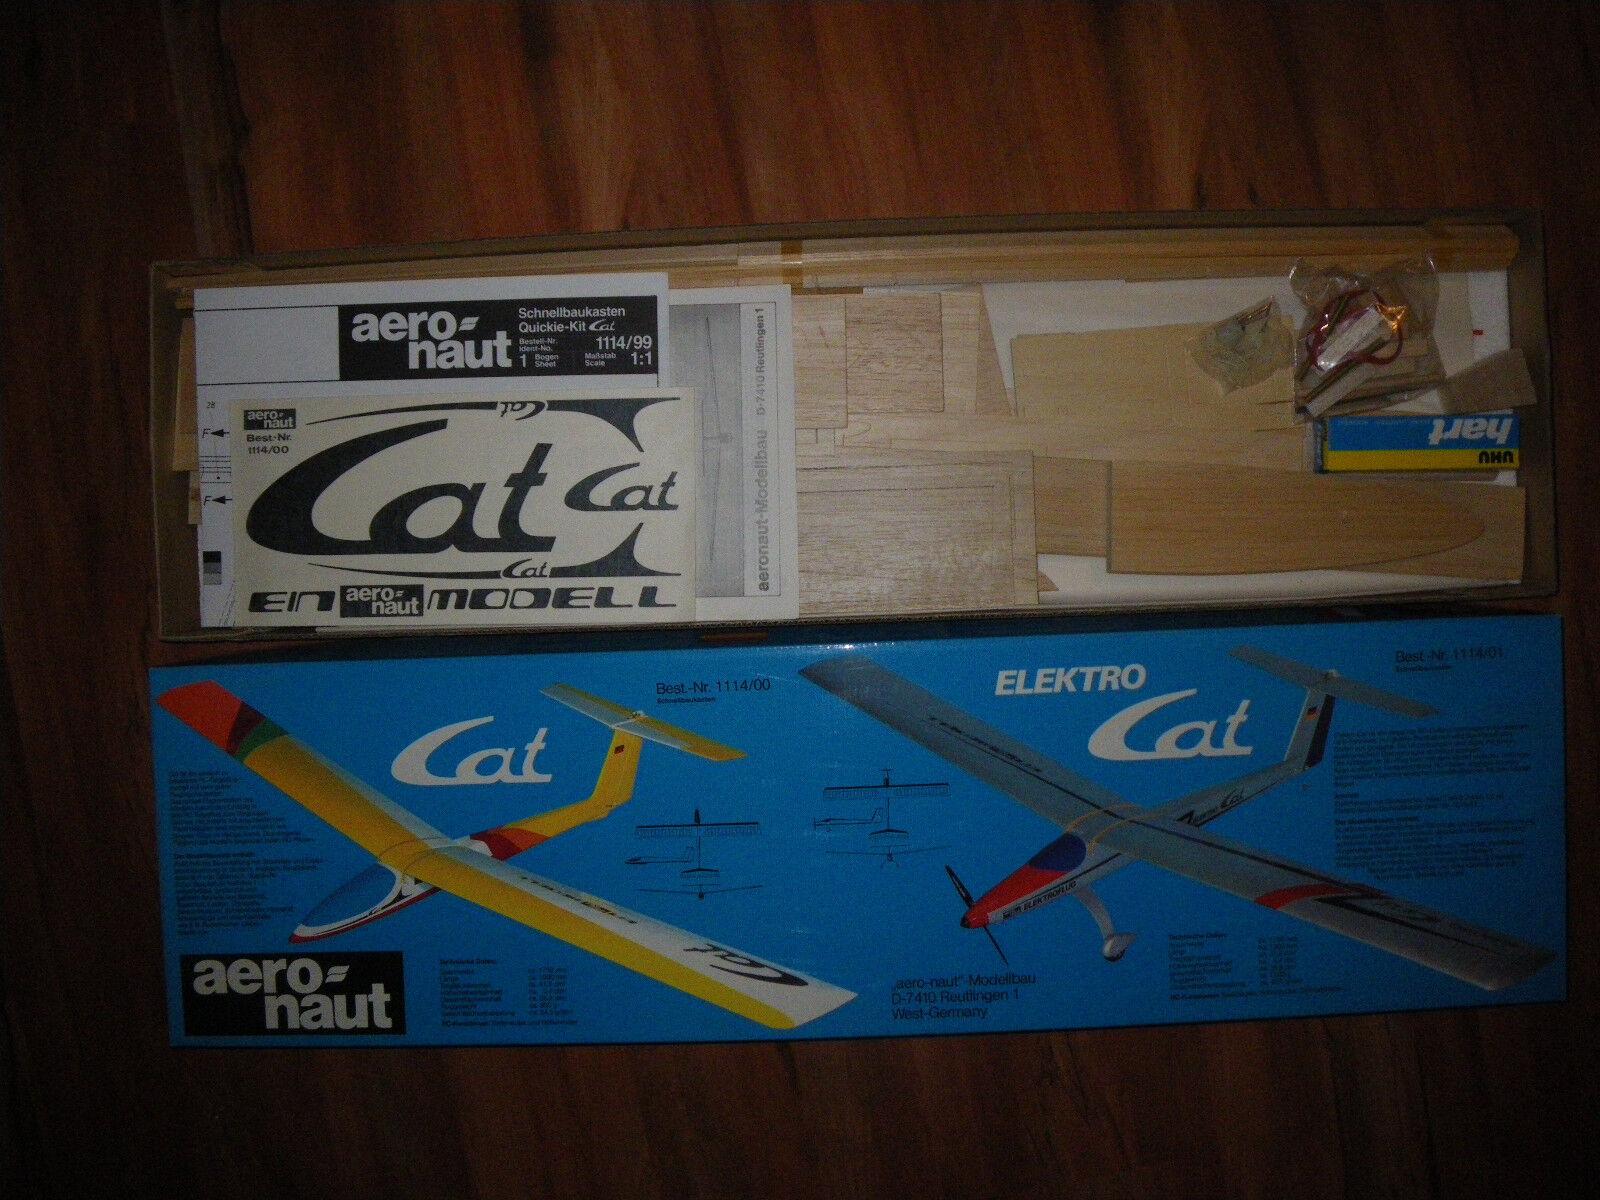 Aero-naut Aeronaut Best. nº 1114 00 Cat